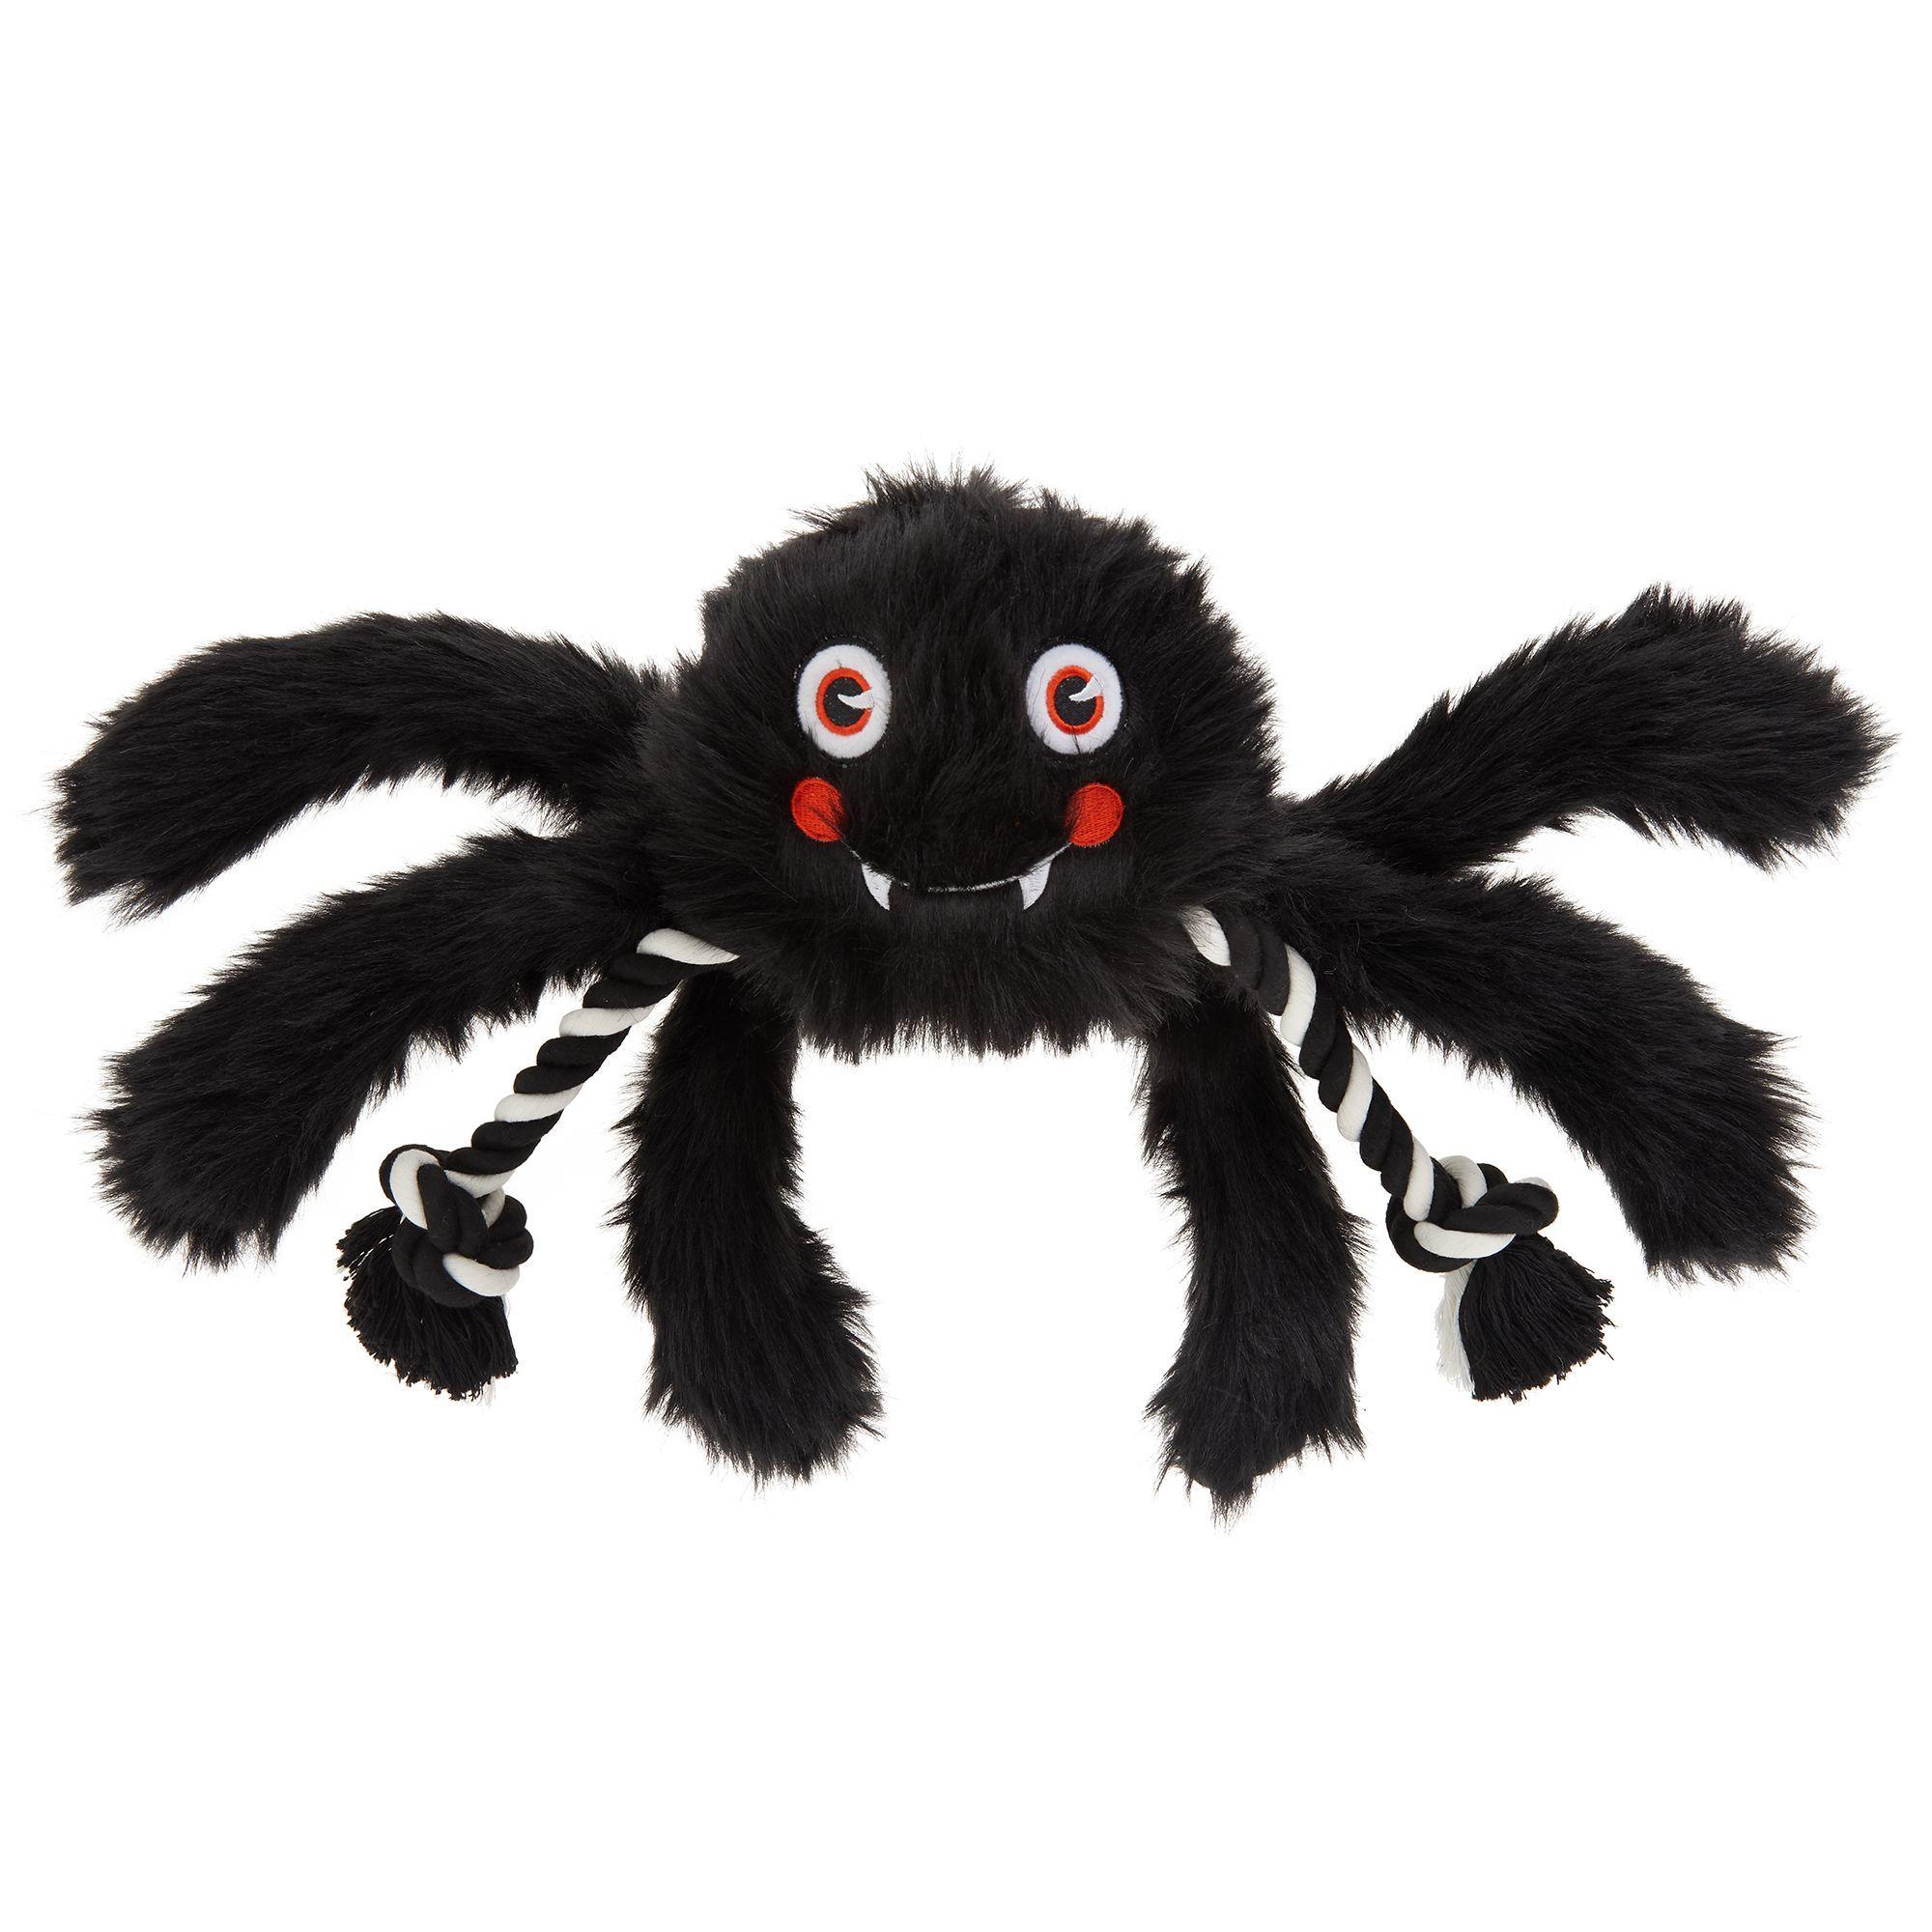 Thrills And Chills Halloween Spider Dog Toy Plush Rope